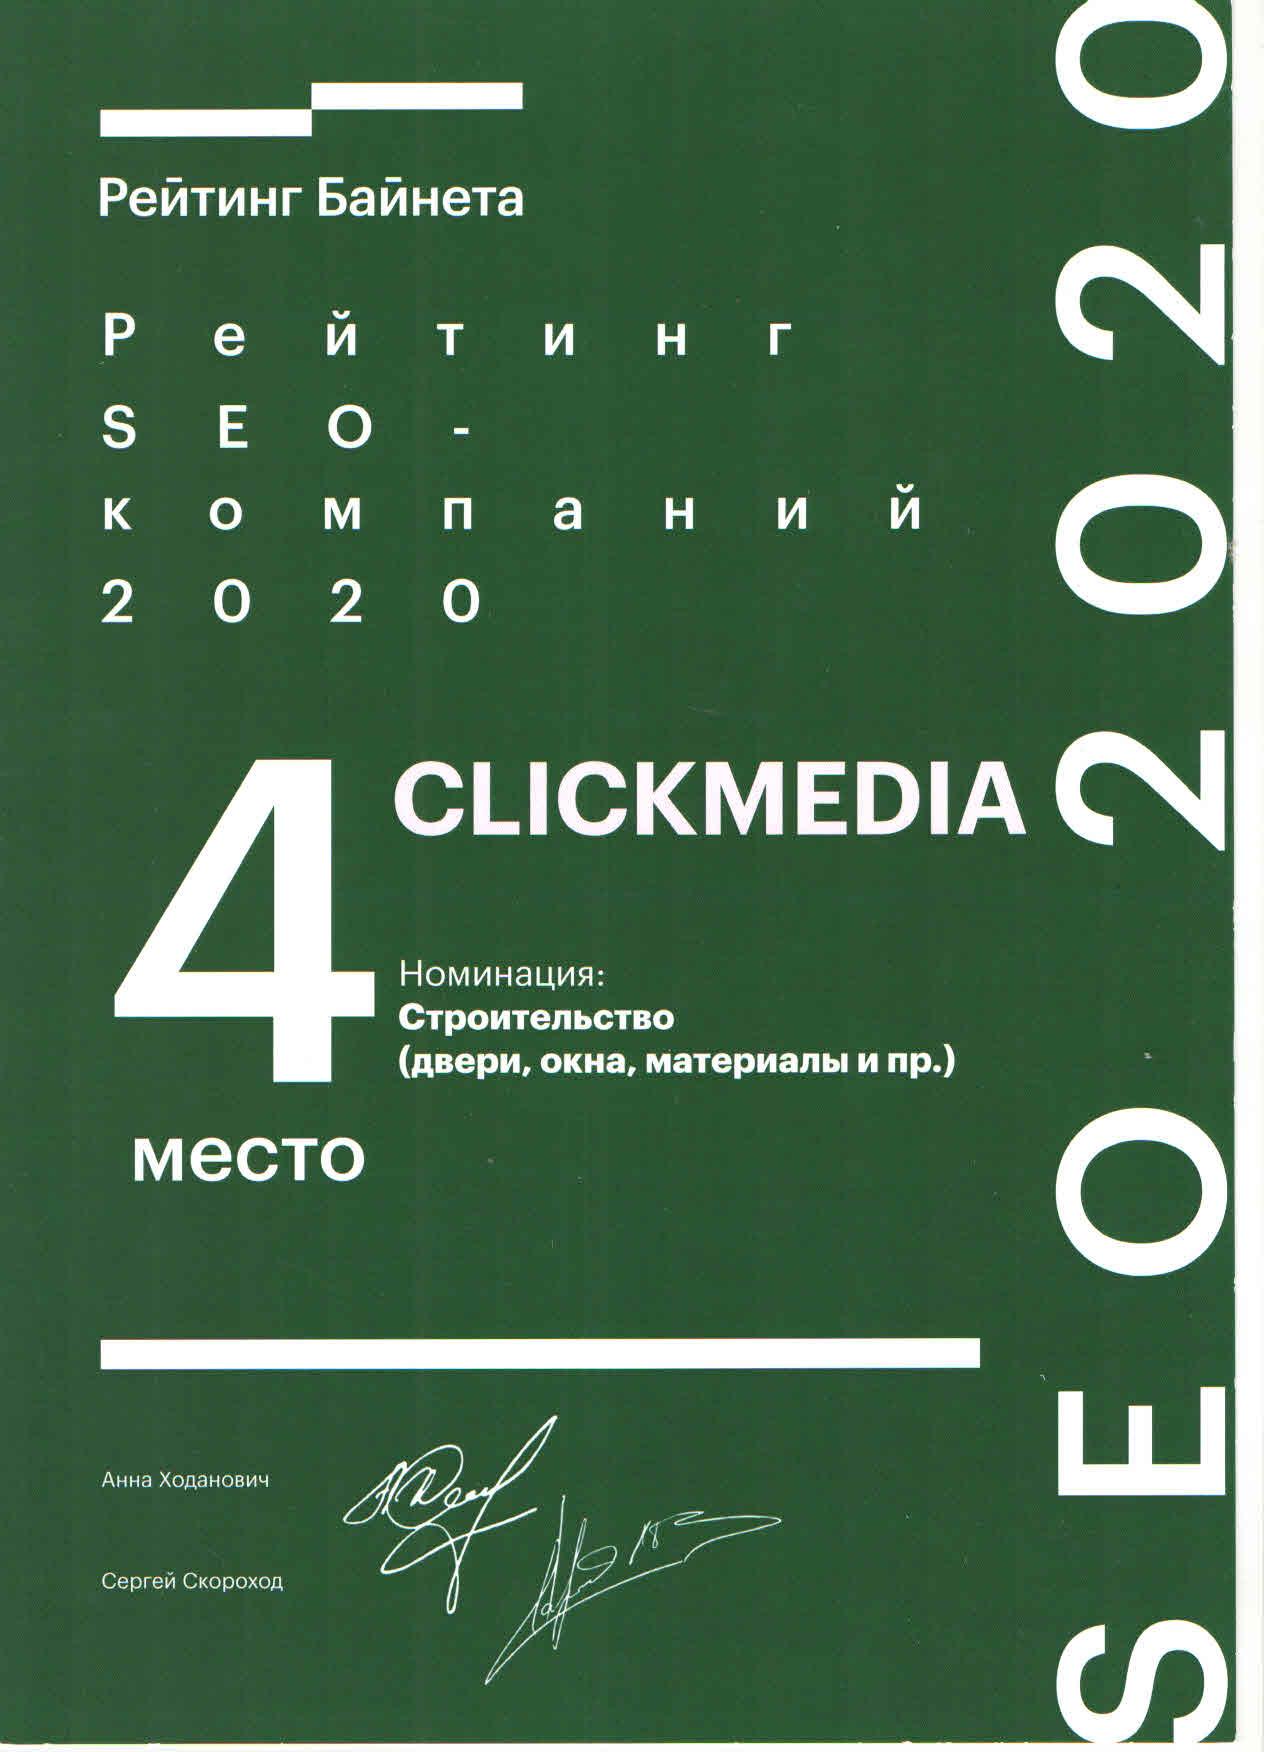 <b>4-е место</b> в рейтинге SEO-компаний Беларуси.<br>Номинация:<br><b>Строительство: двери, окна, материалы</b>